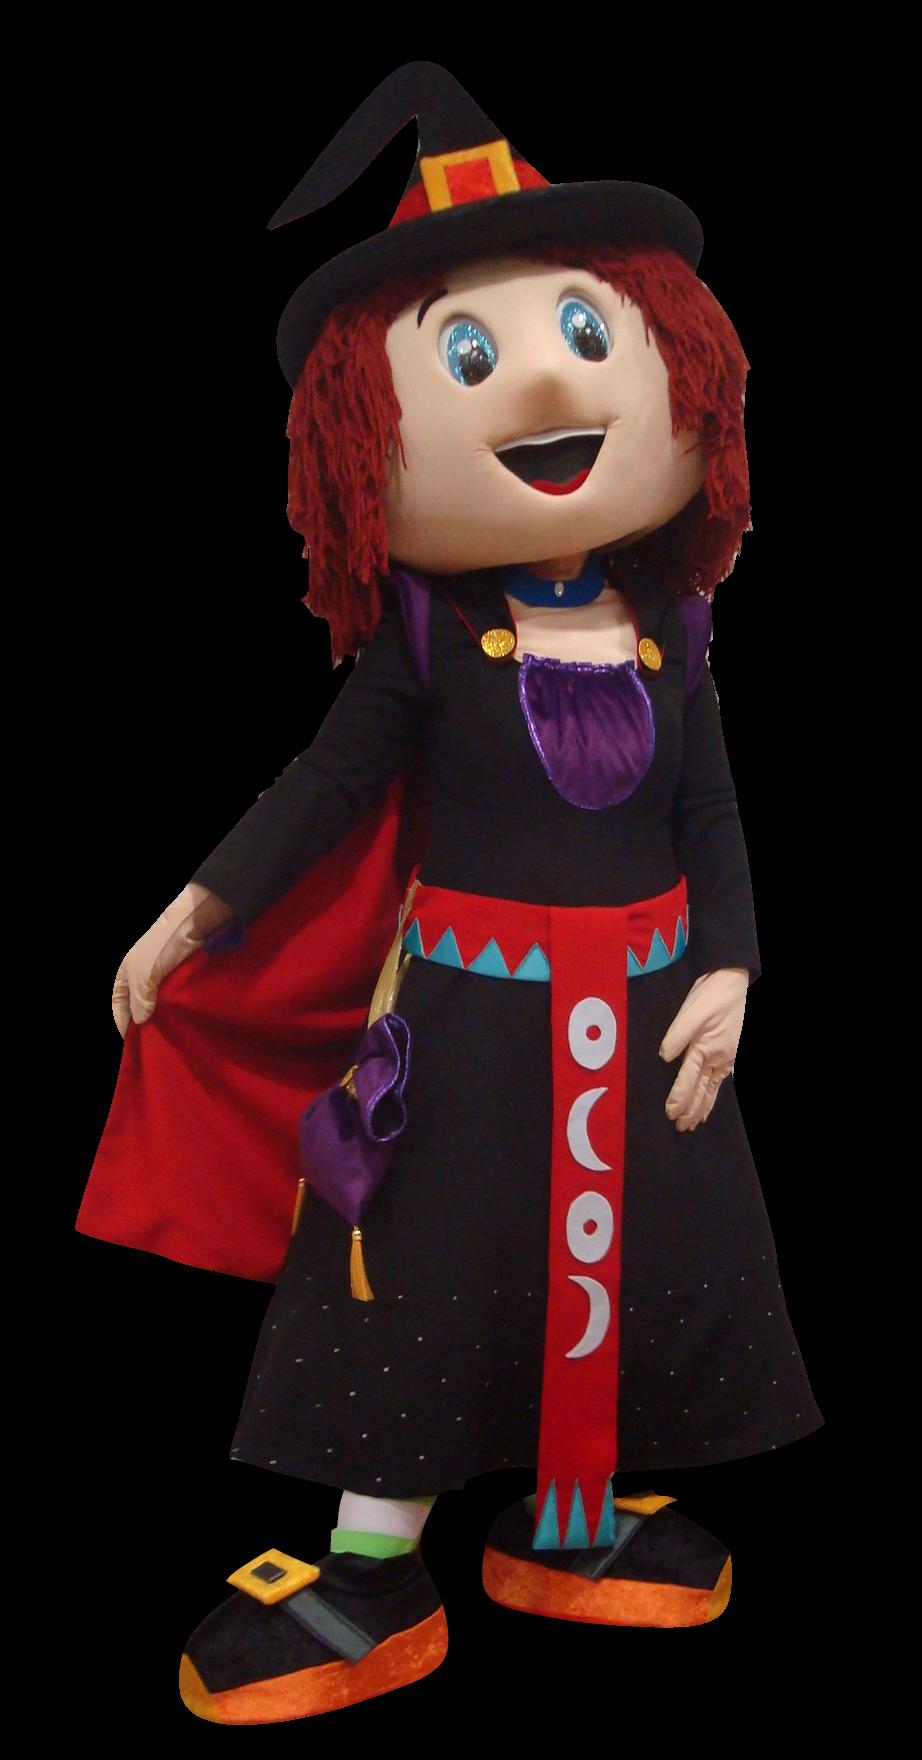 Mascote Partyval Bruxa cartucha